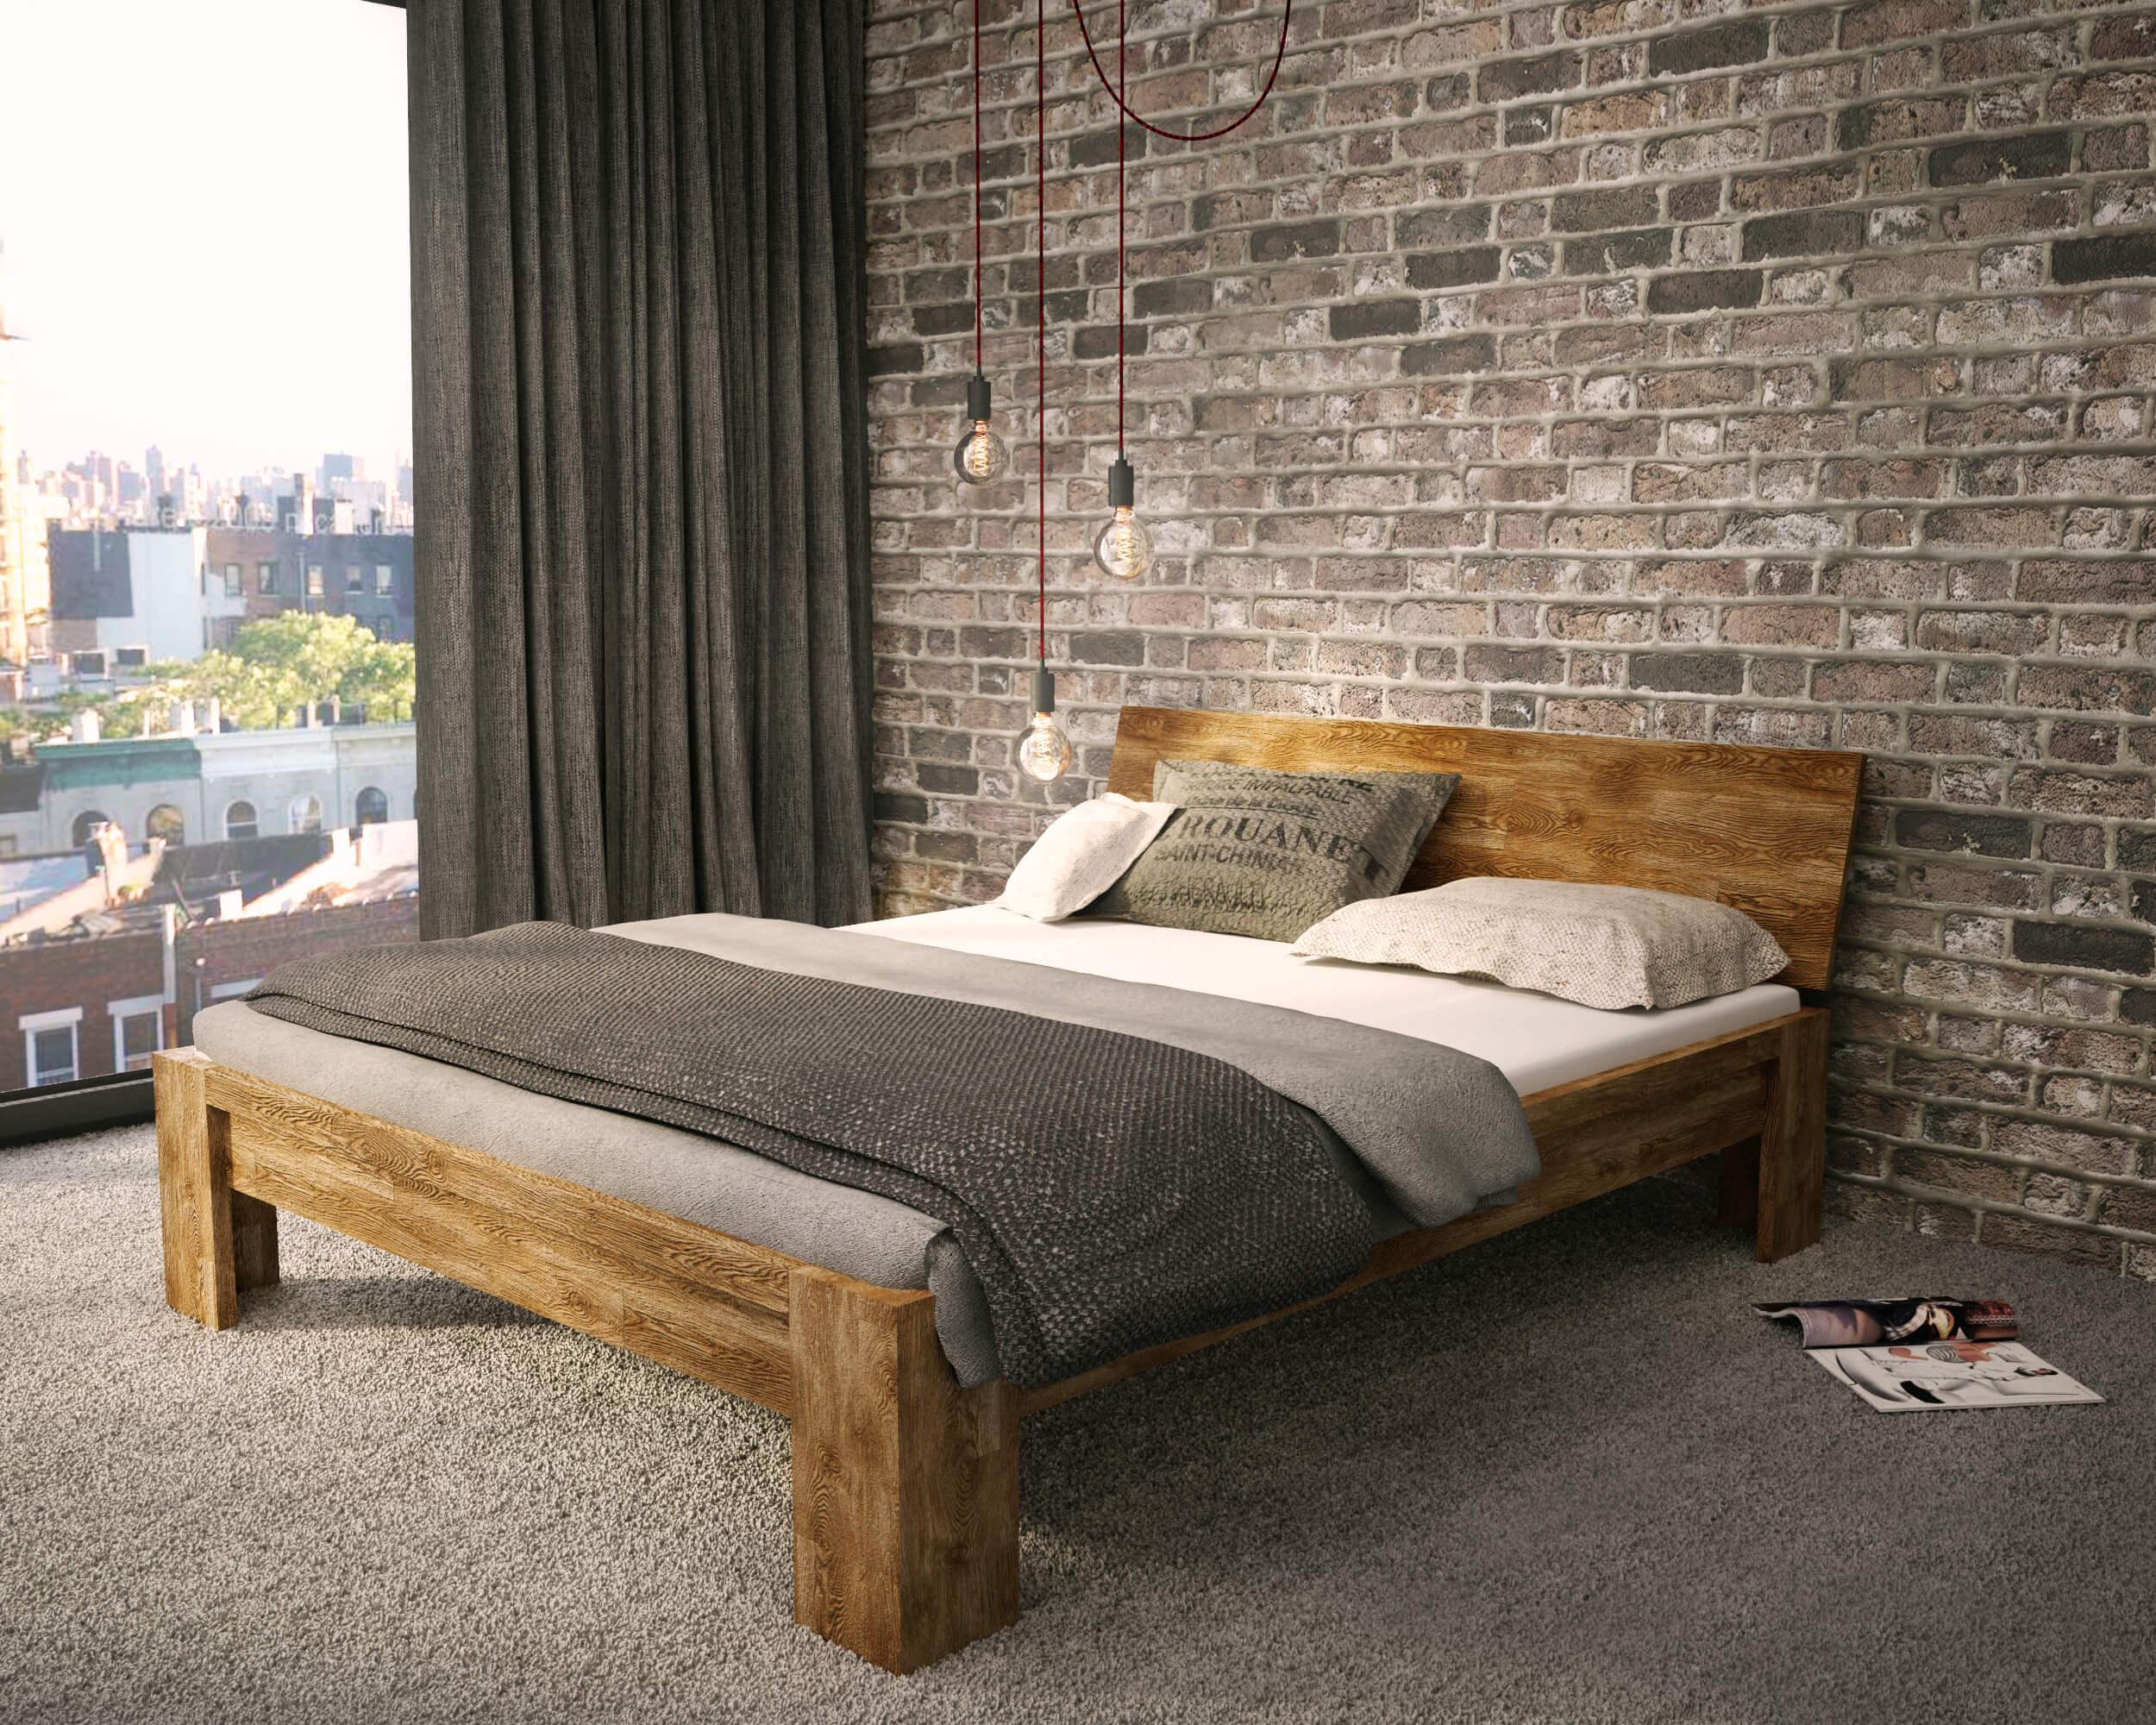 łóżko Dębowe Postarzane Rustical